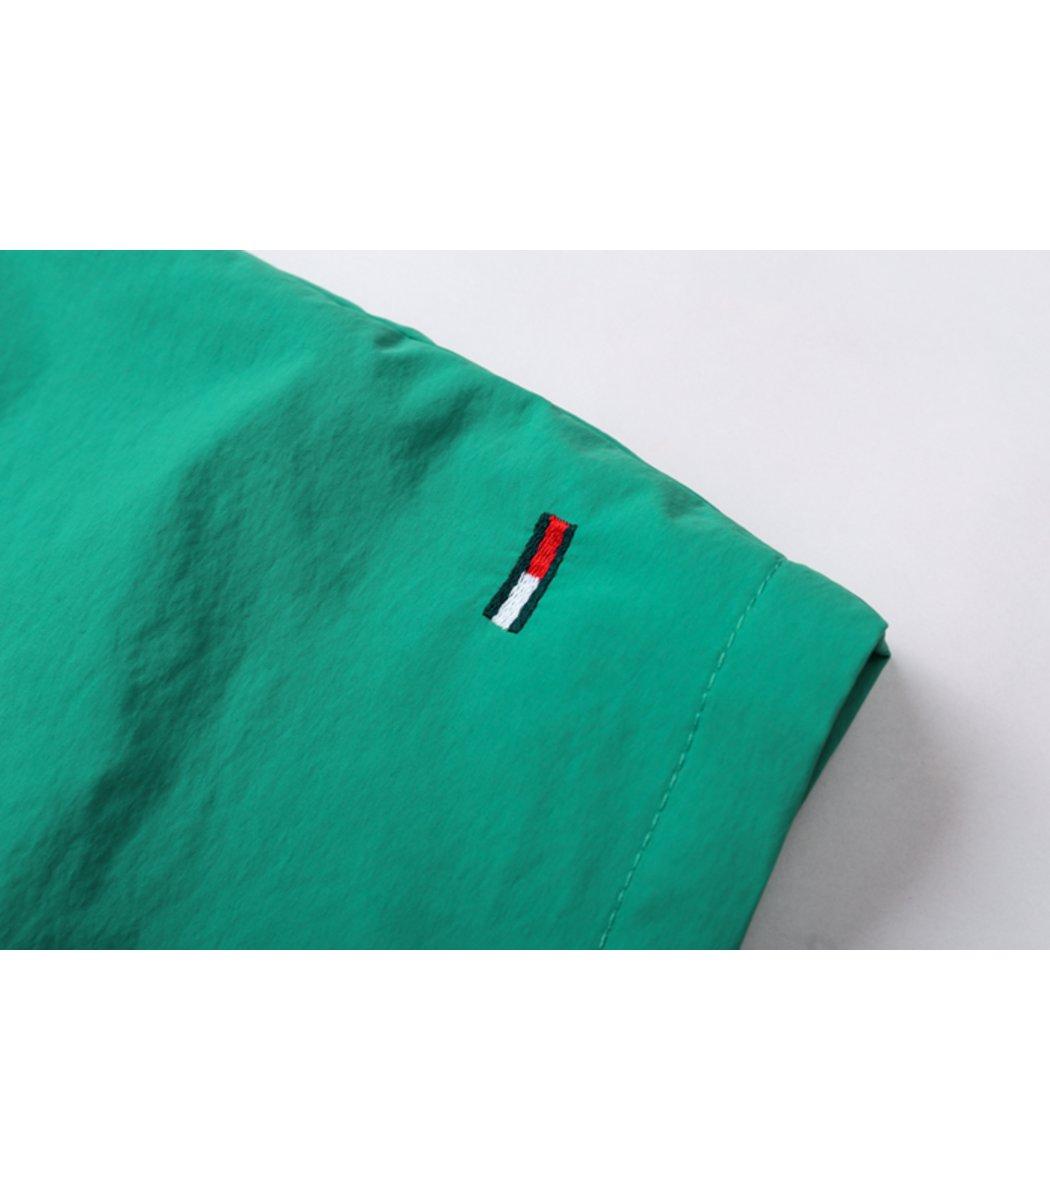 Зеленые шорты Tommy Hilfiger Dolphin 2 с карманом